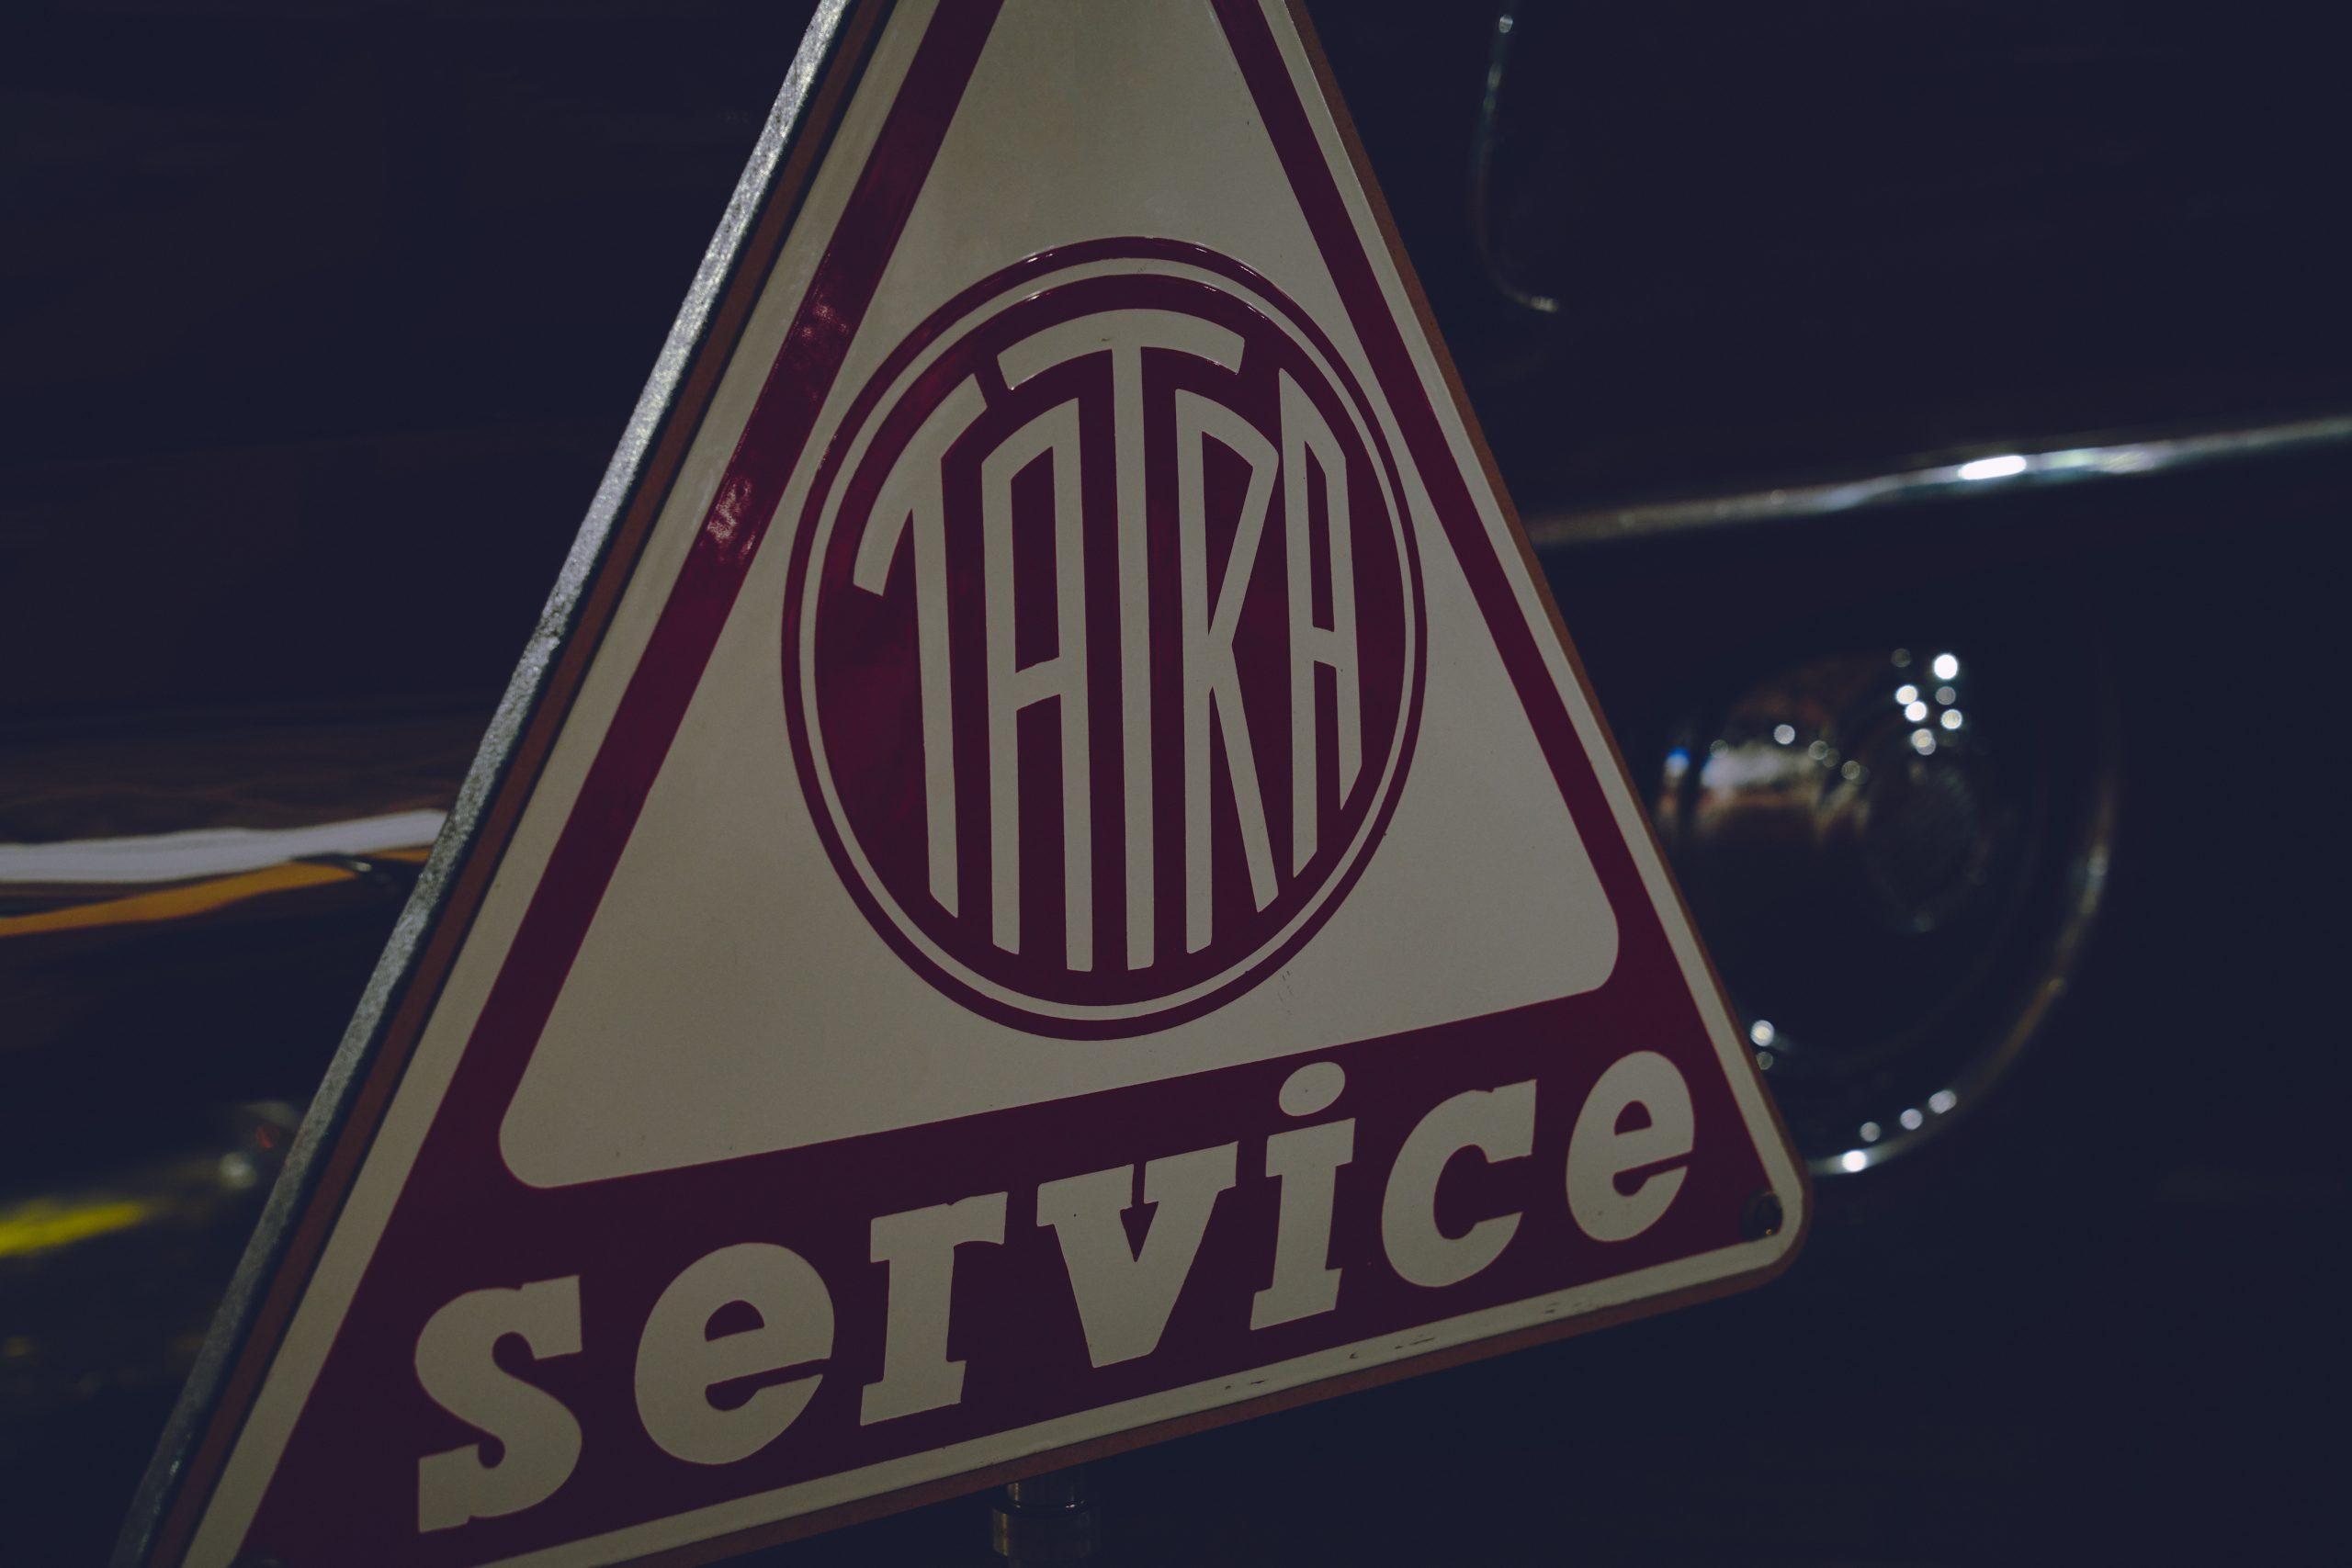 Nashville vintage car museum tatra service